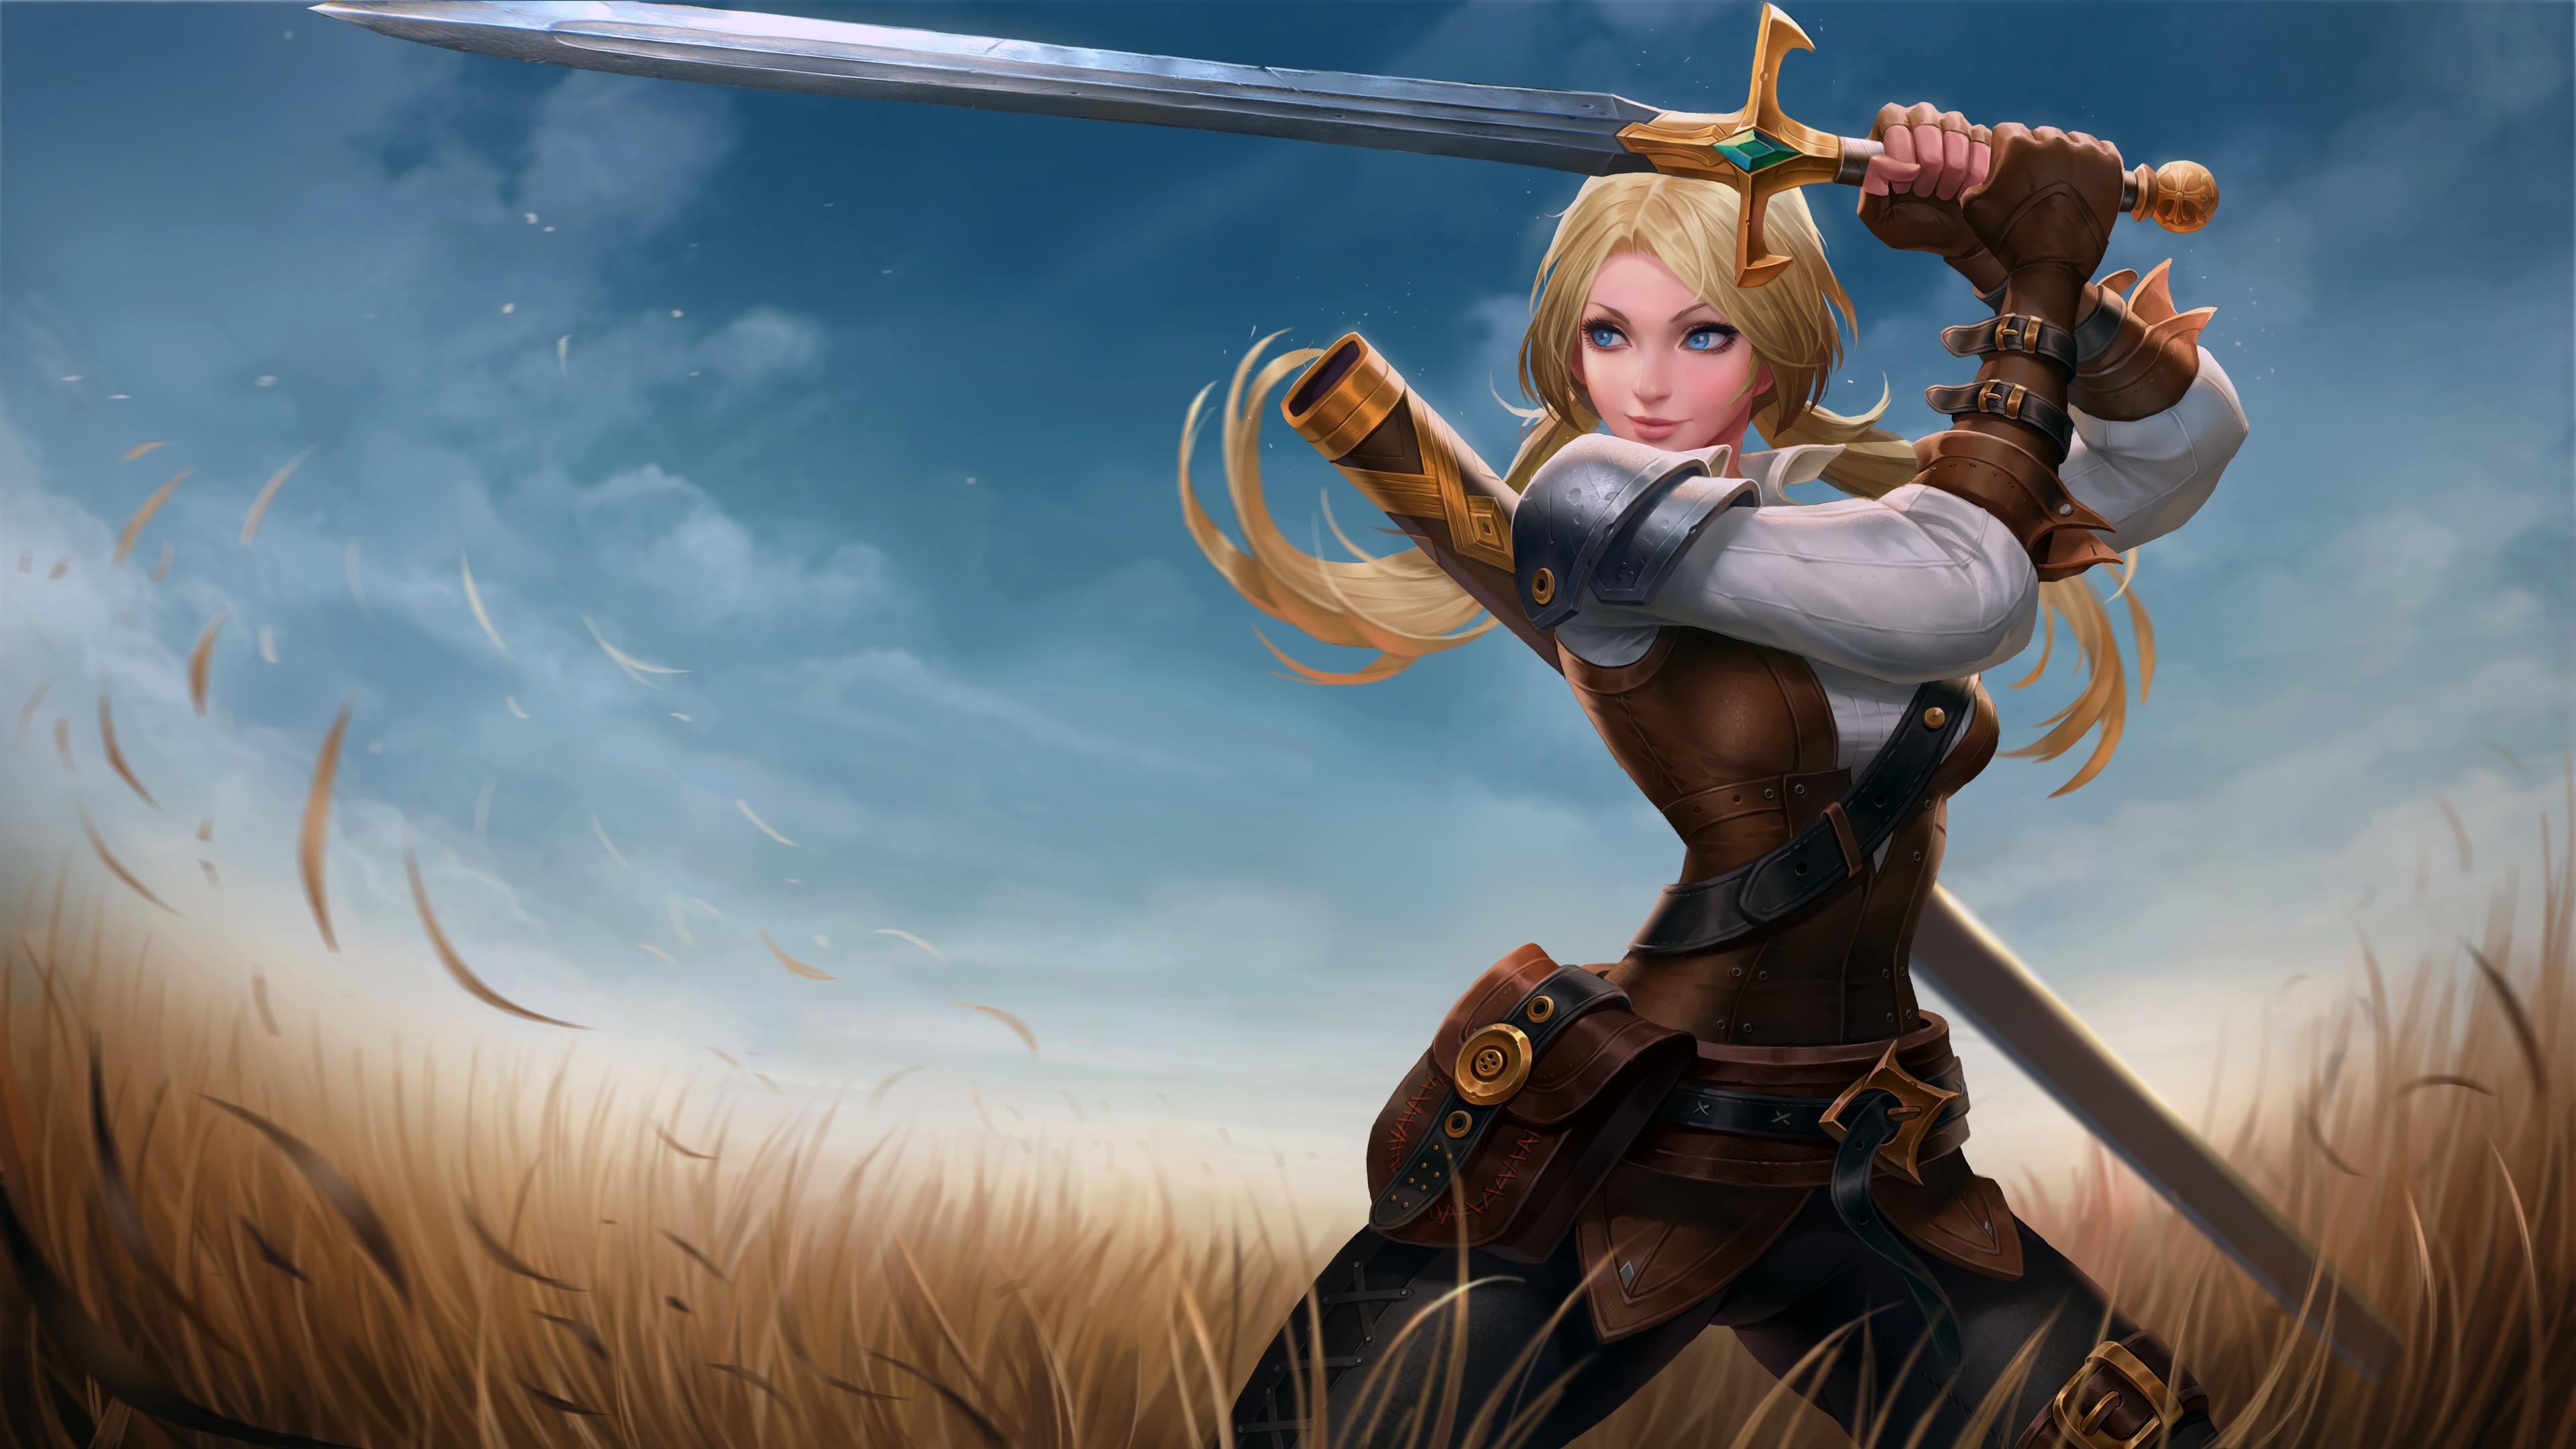 blue eyes girl sword woman warrior 4k 1540751640 - Blue Eyes Girl Sword Woman Warrior 4k - warrior wallpapers, sword wallpapers, hd-wallpapers, digital art wallpapers, artwork wallpapers, artist wallpapers, 5k wallpapers, 4k-wallpapers